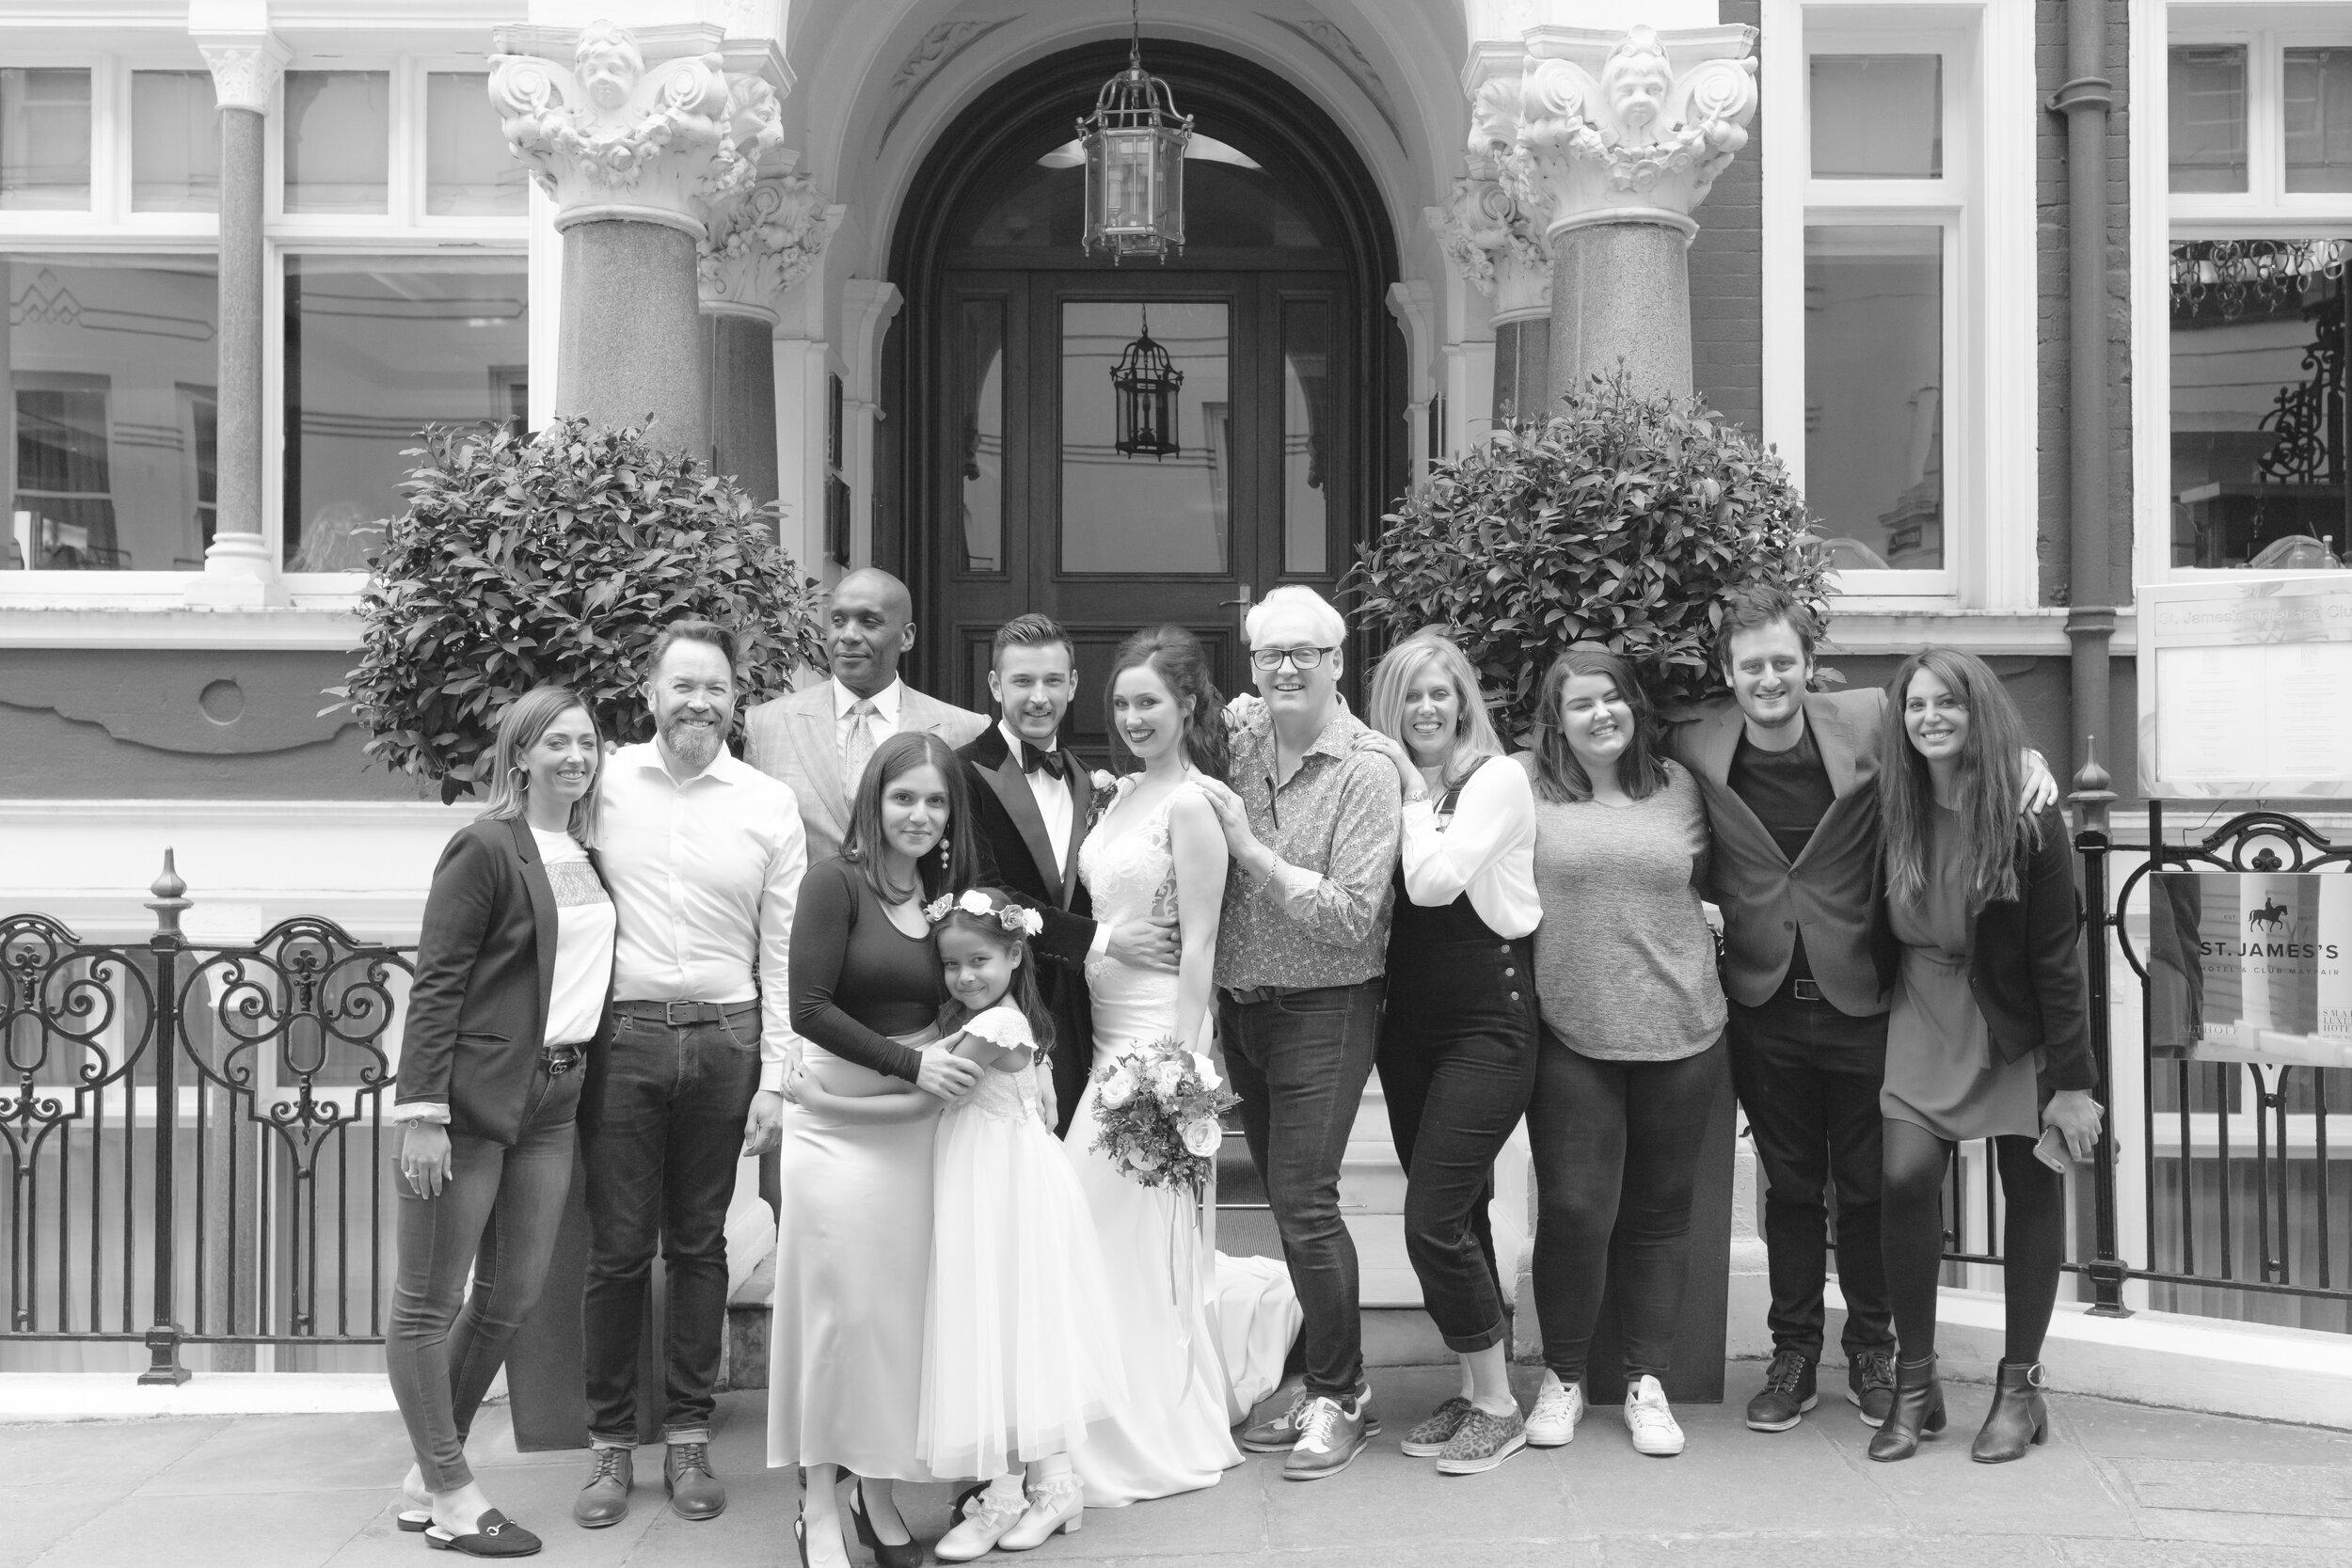 Davina Marques_DKMevents Wedding Planning_London_Joana Senkute Photography